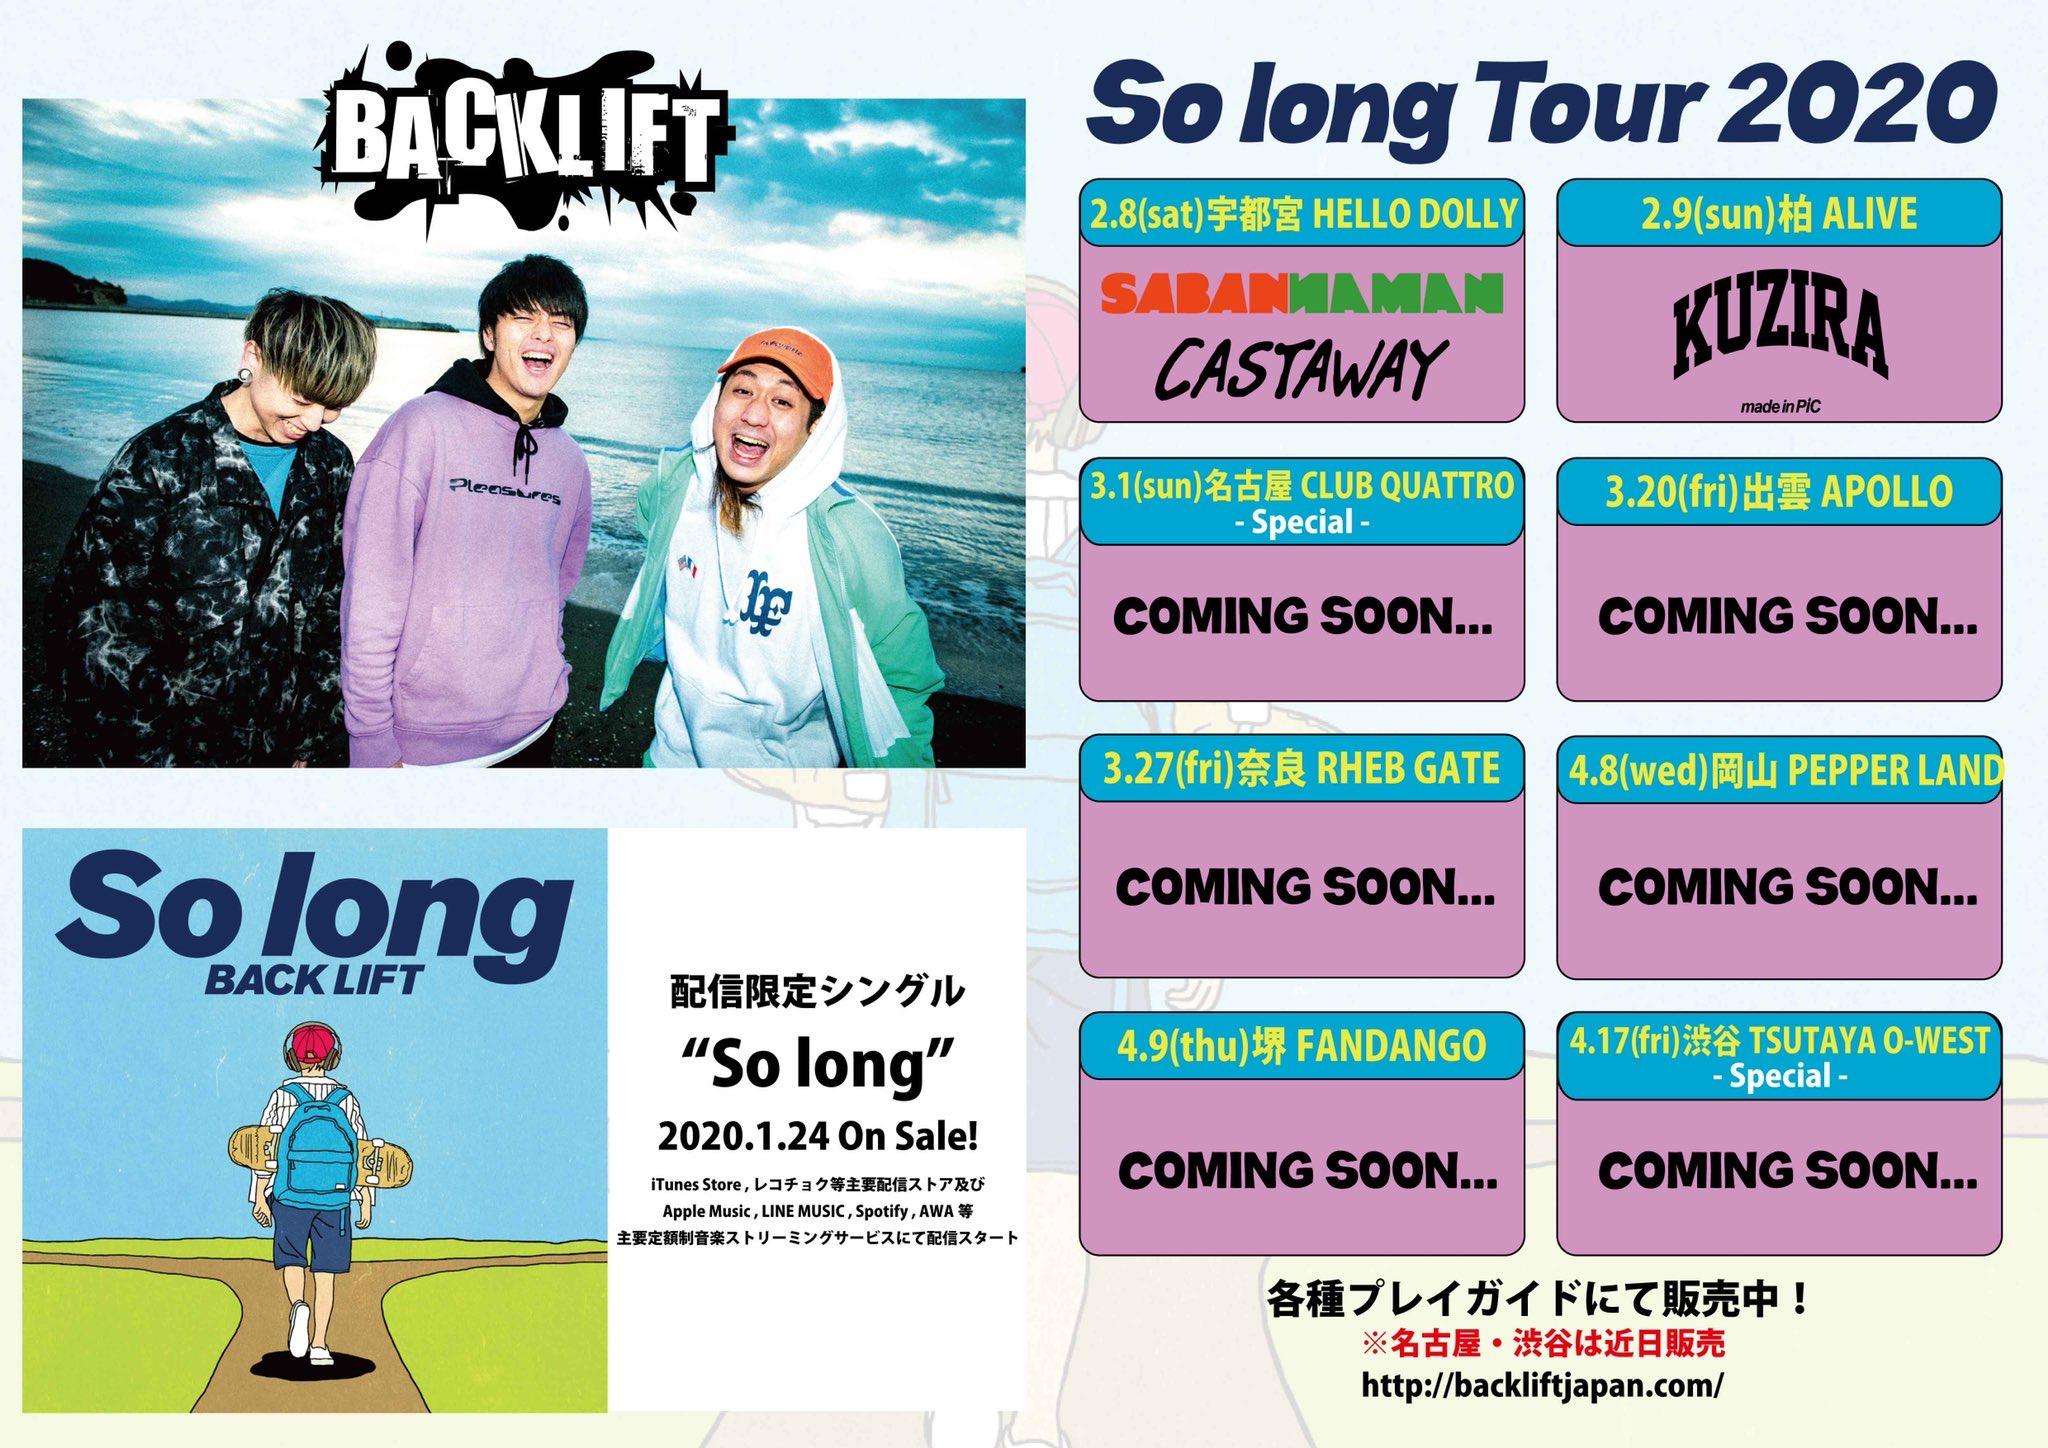 BACKLIFT/So long Tour 2020